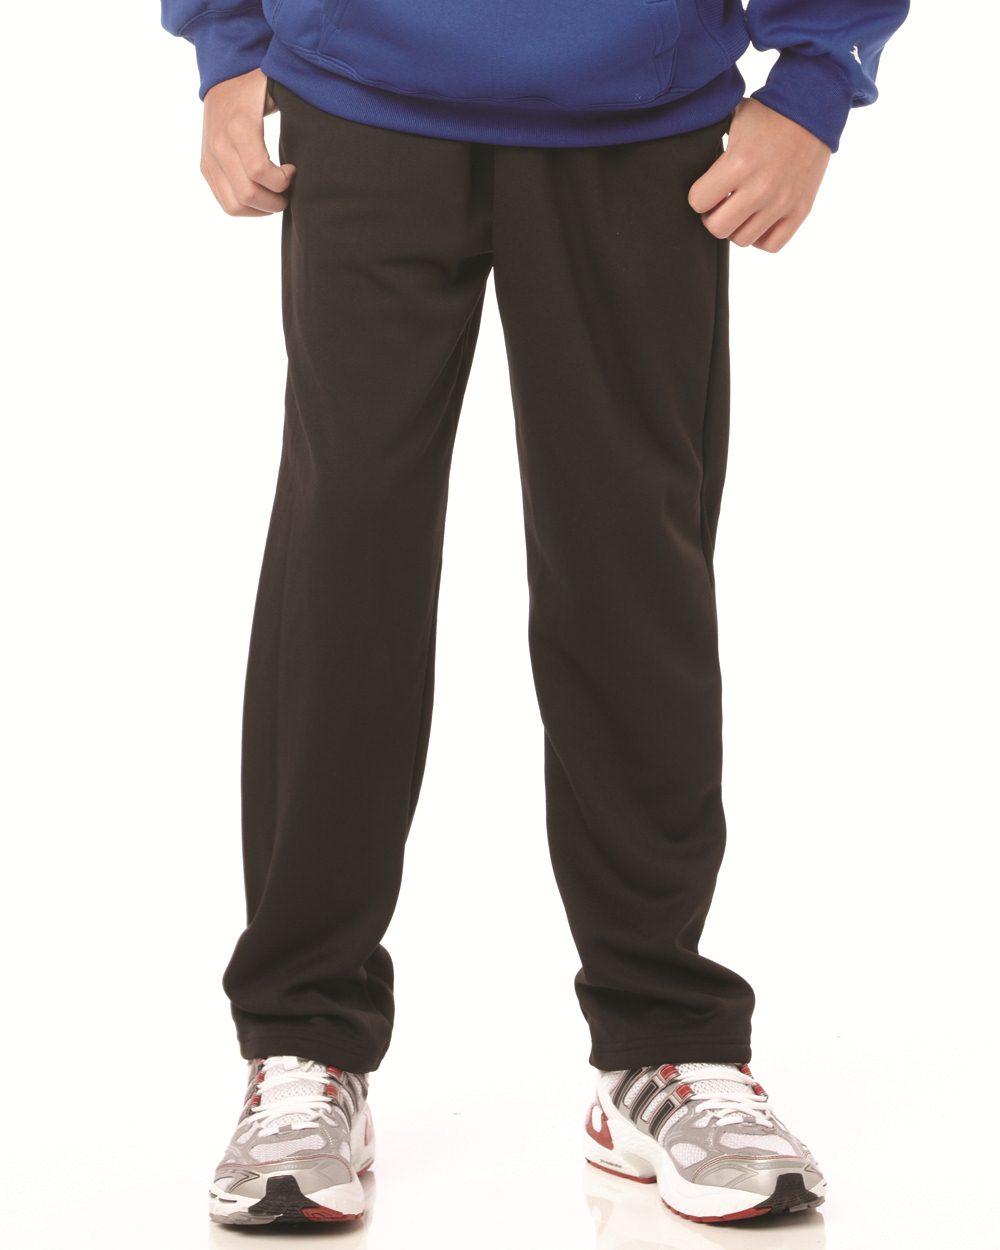 Badger 2478 - BT5 Youth Fleece Sweatpant